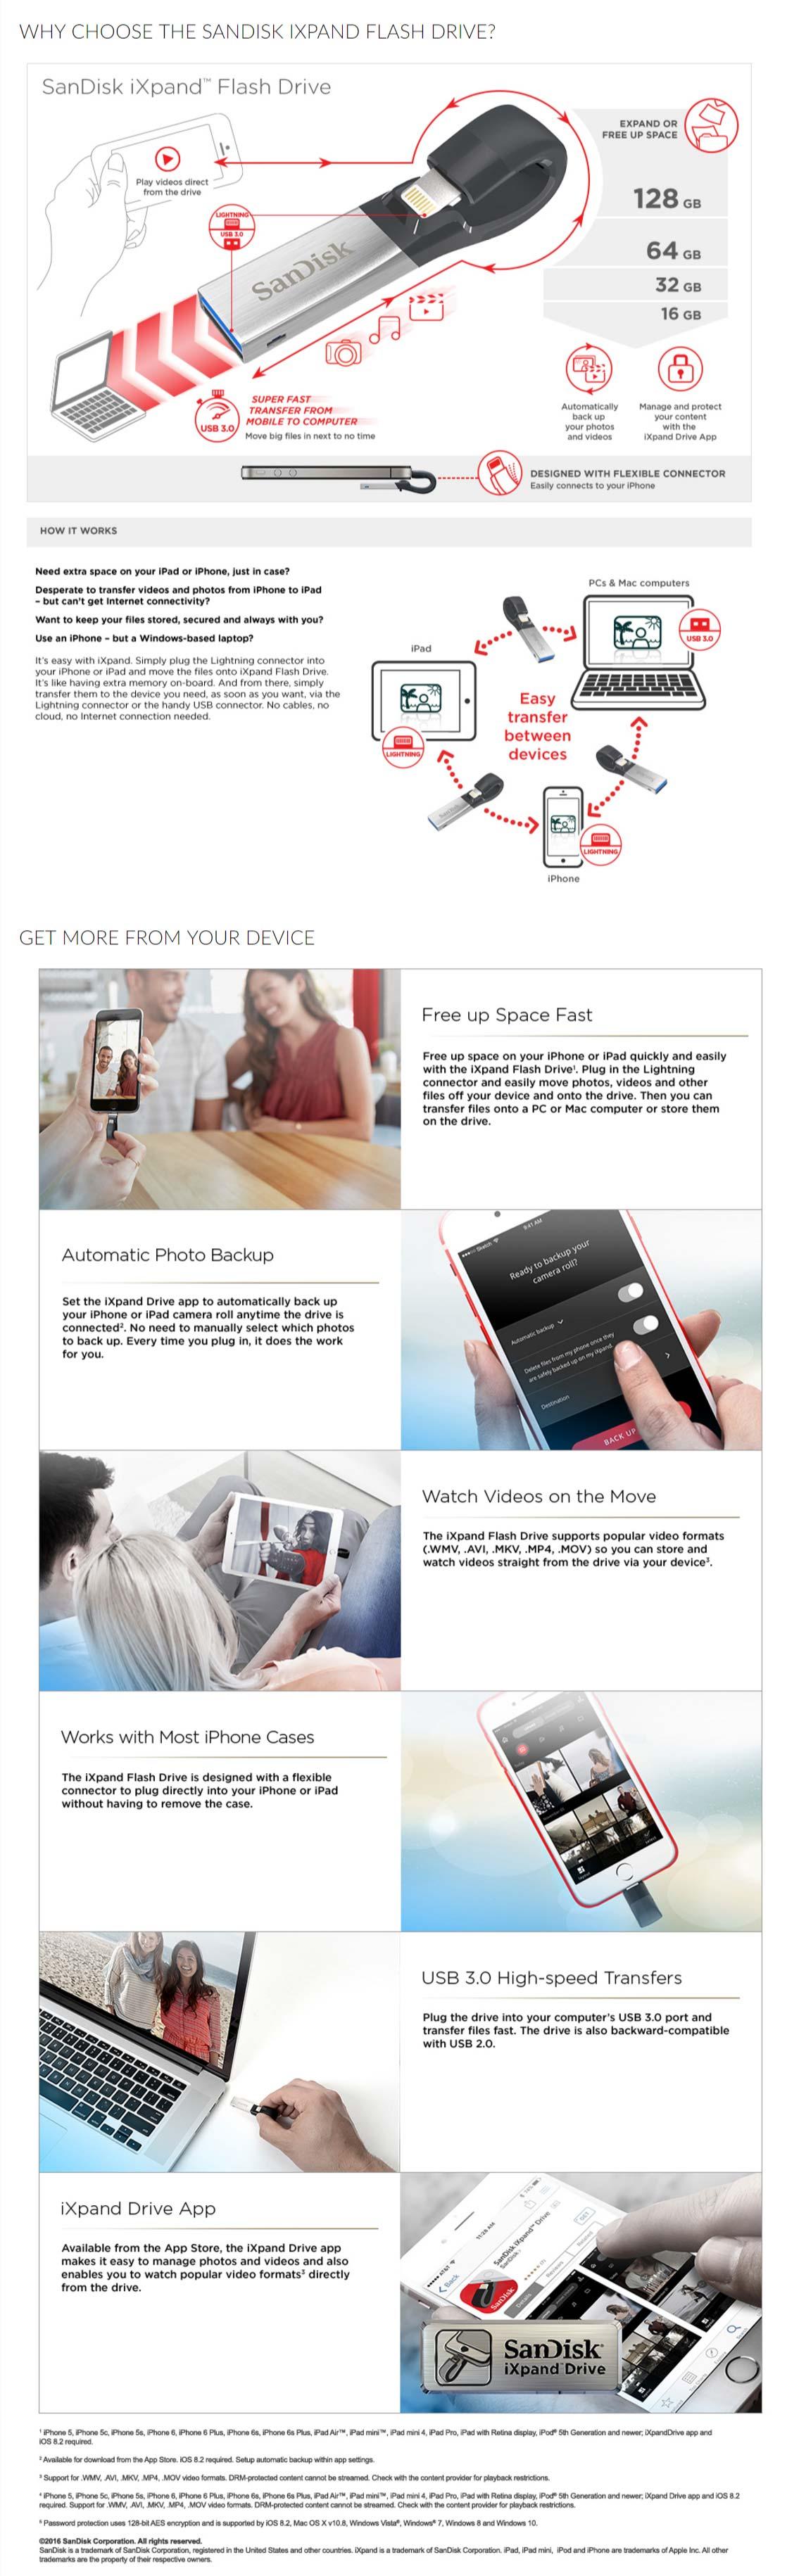 SanDisk iXpand 16GB V2 Flash Drive